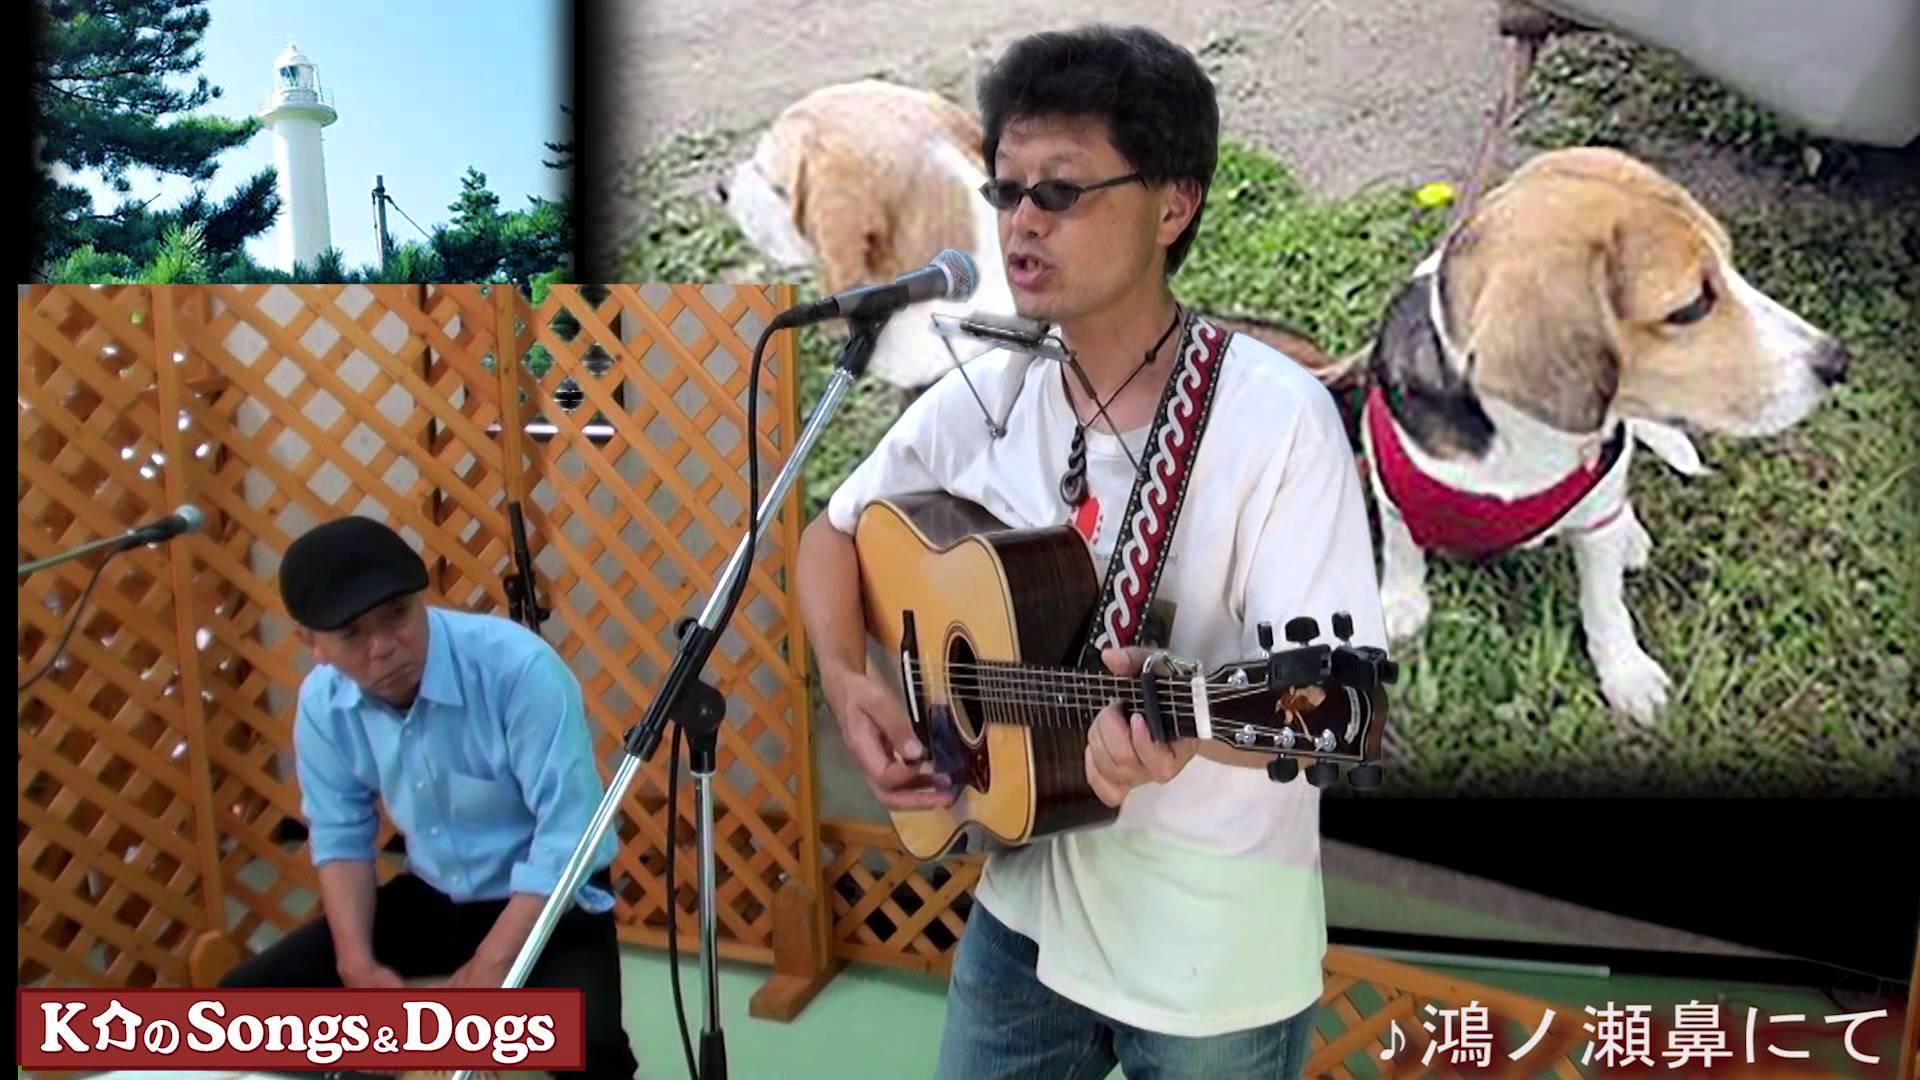 K介のSongs&Dogs週末はミュージシャン~67